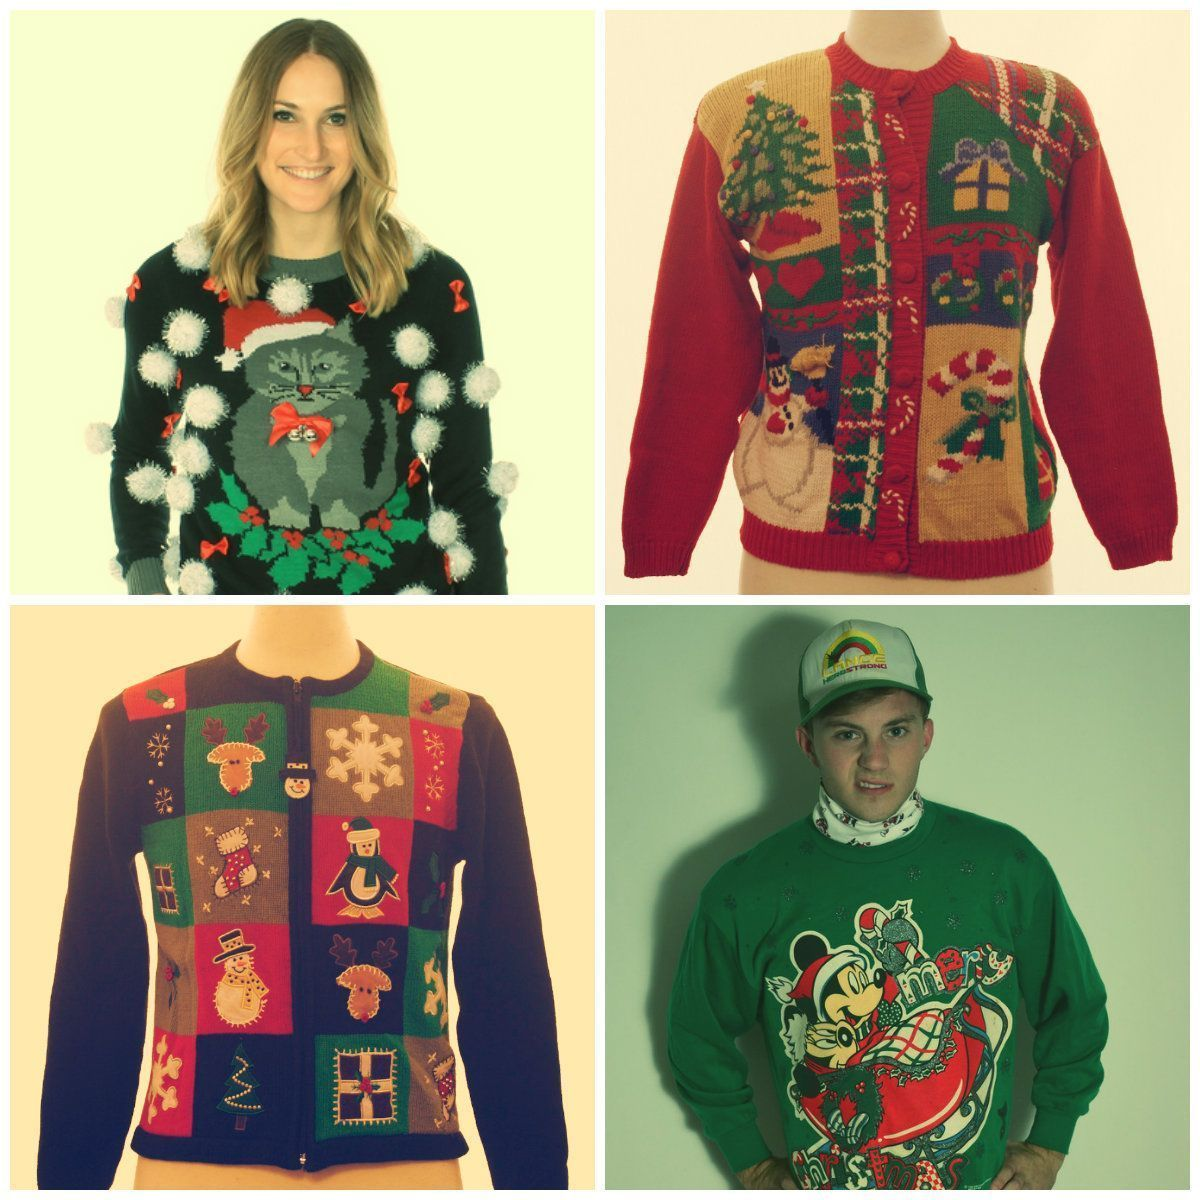 Top 15 Ugliest Christmas Sweater Ever